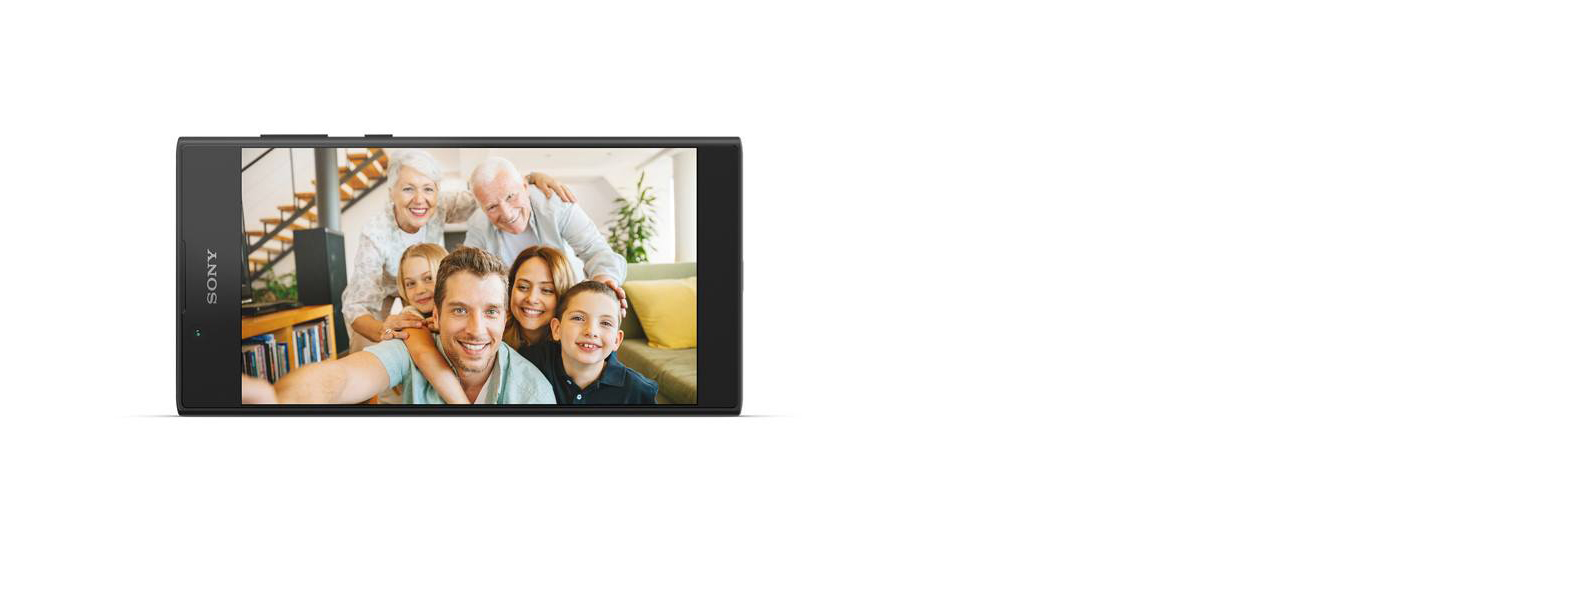 Sony Xperia L1 (6)